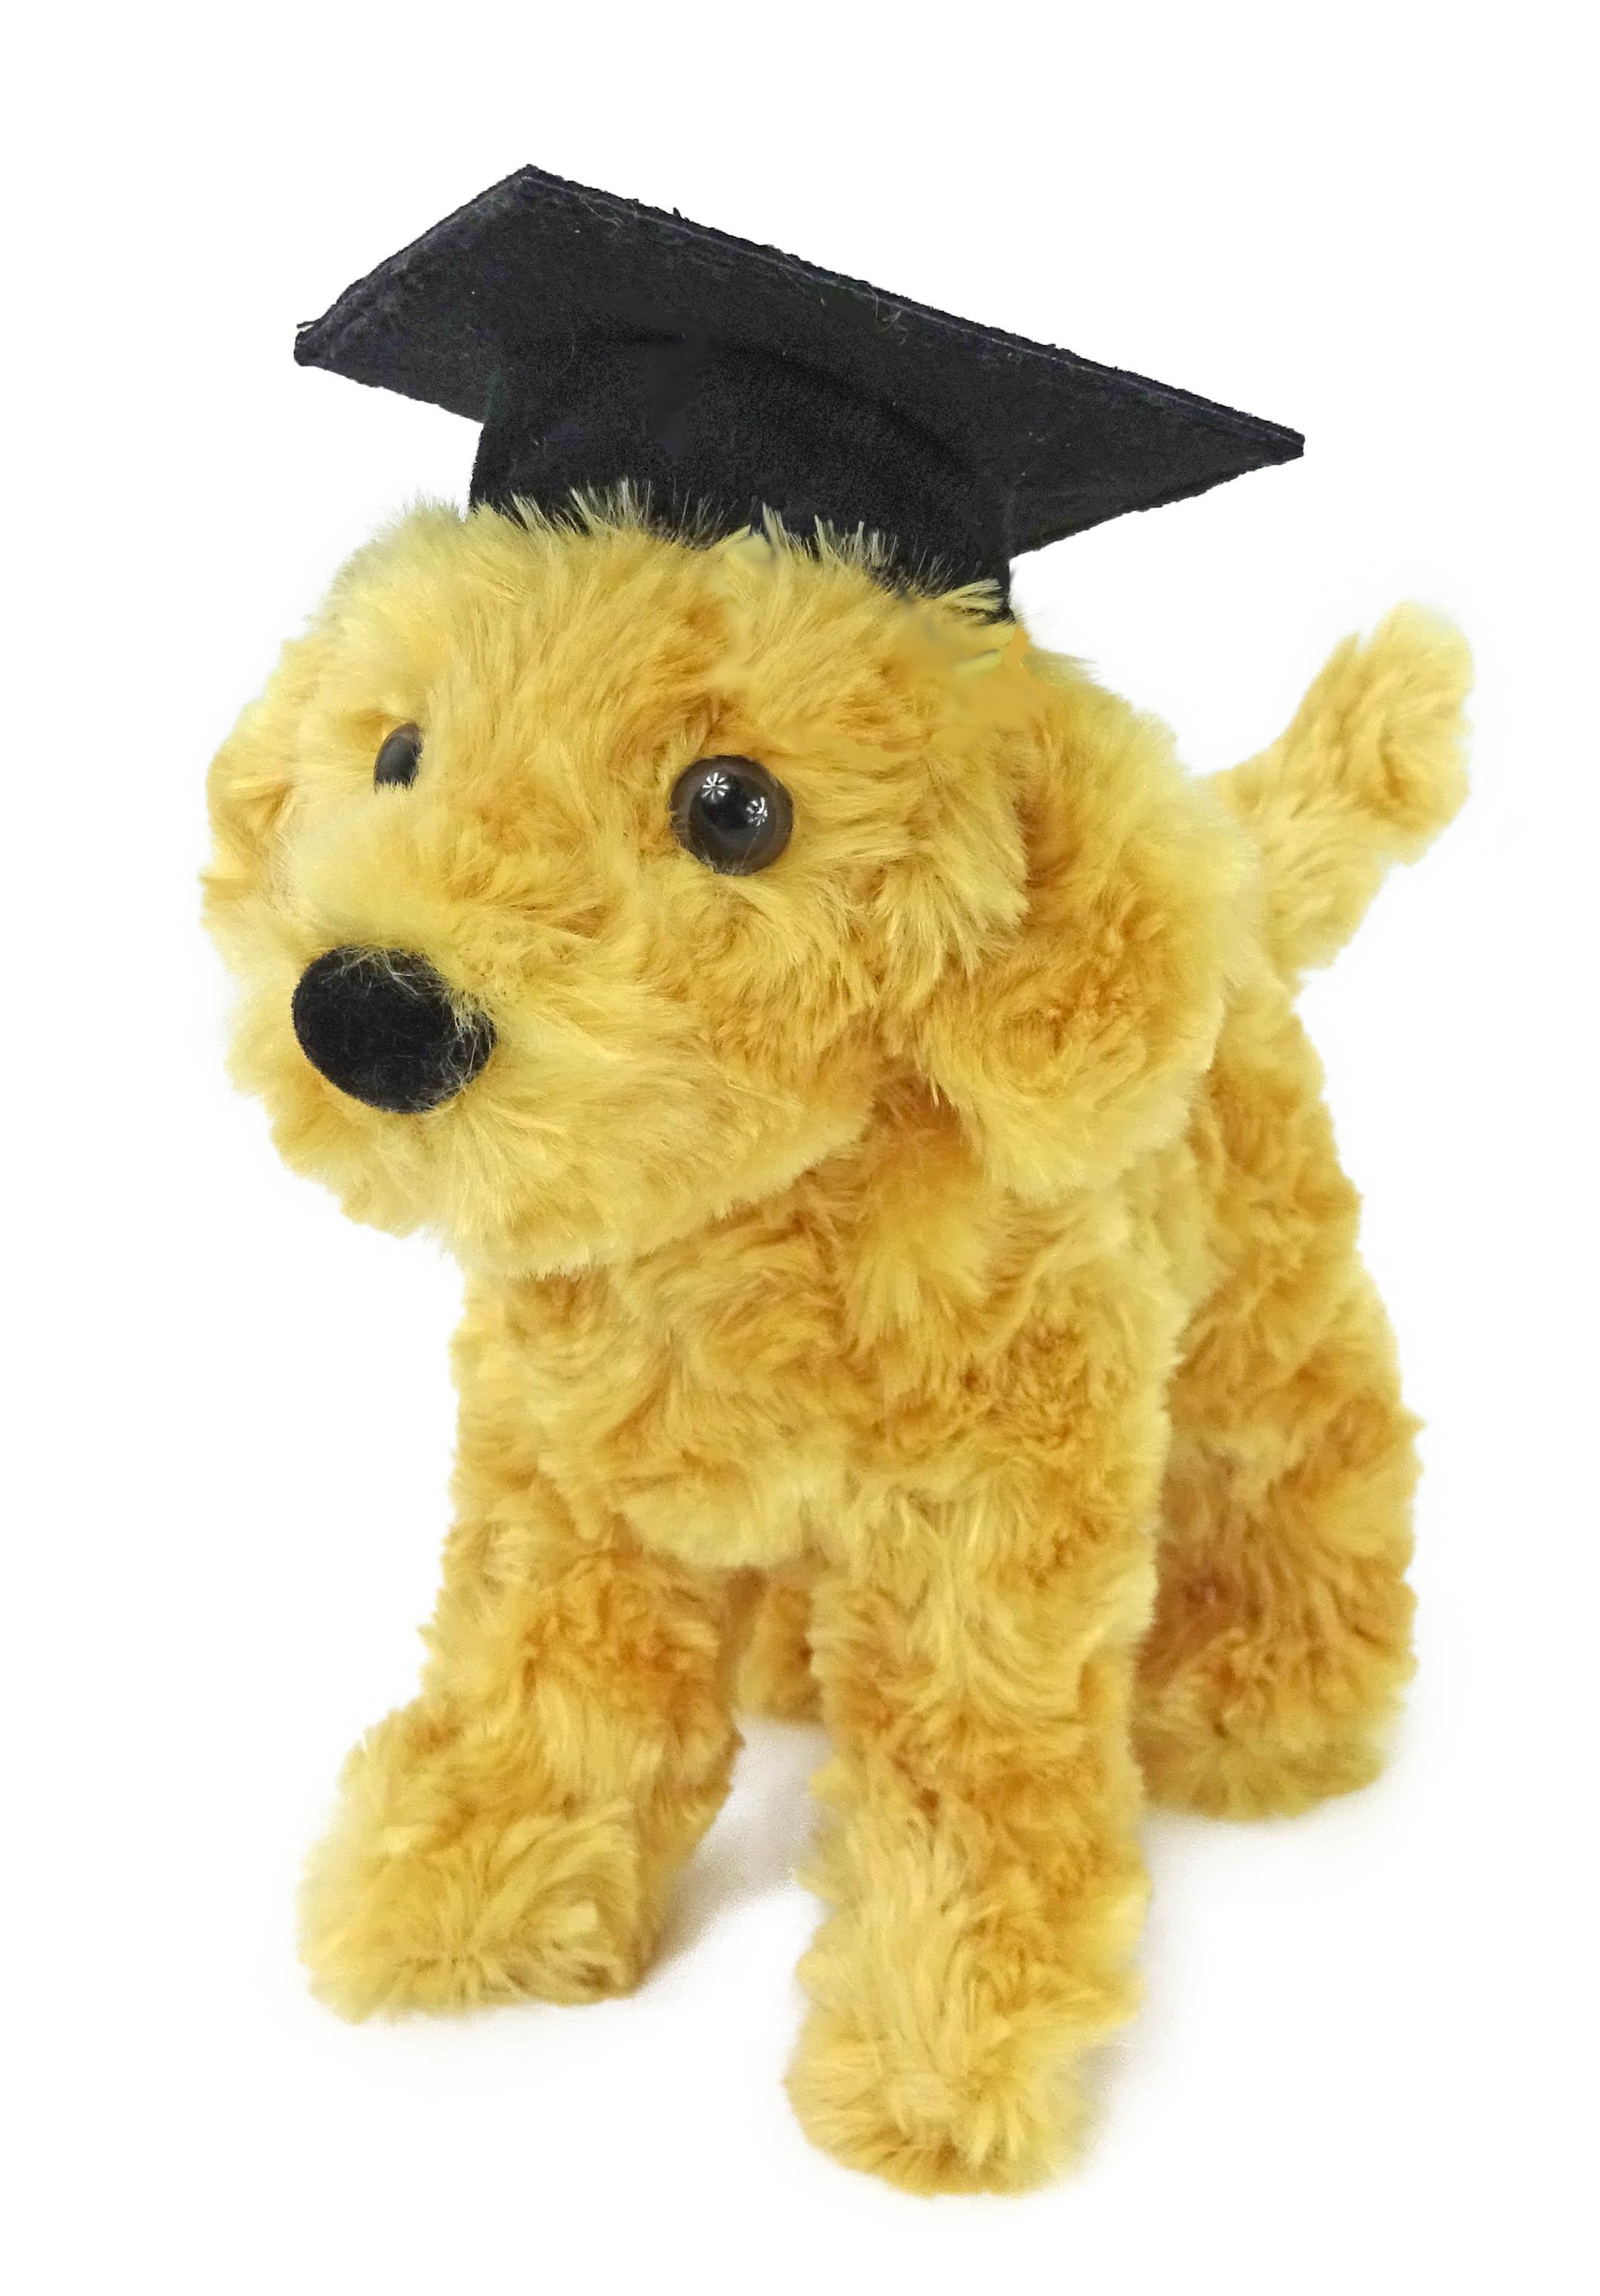 Graduation Caps for small plush promotional DOUGLAS toy animals.